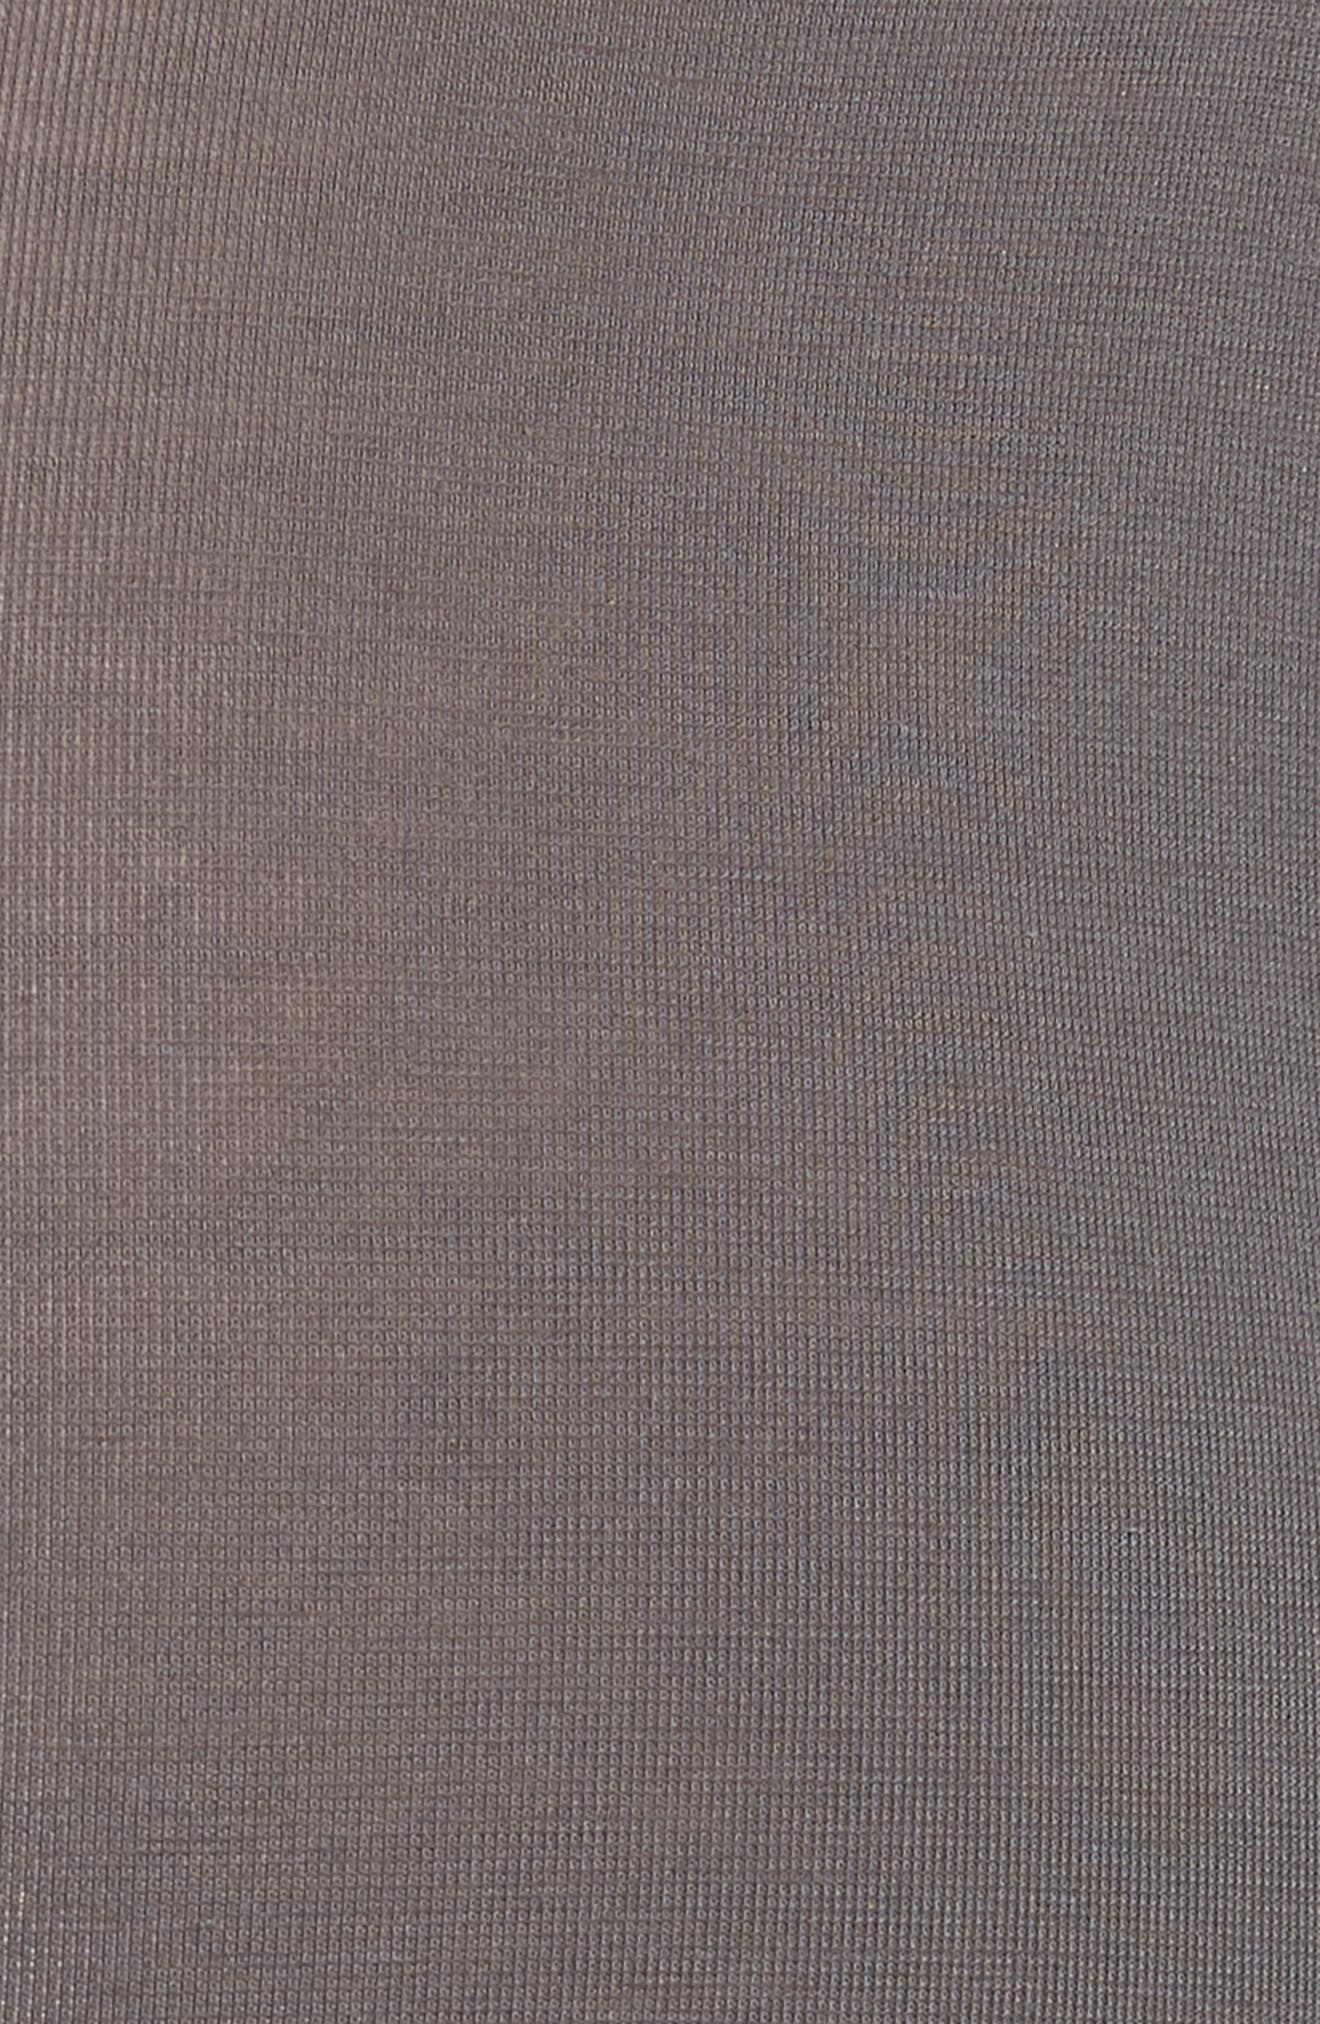 Cool Cotton Boxer Briefs,                             Alternate thumbnail 5, color,                             Iron Grey/ Agave